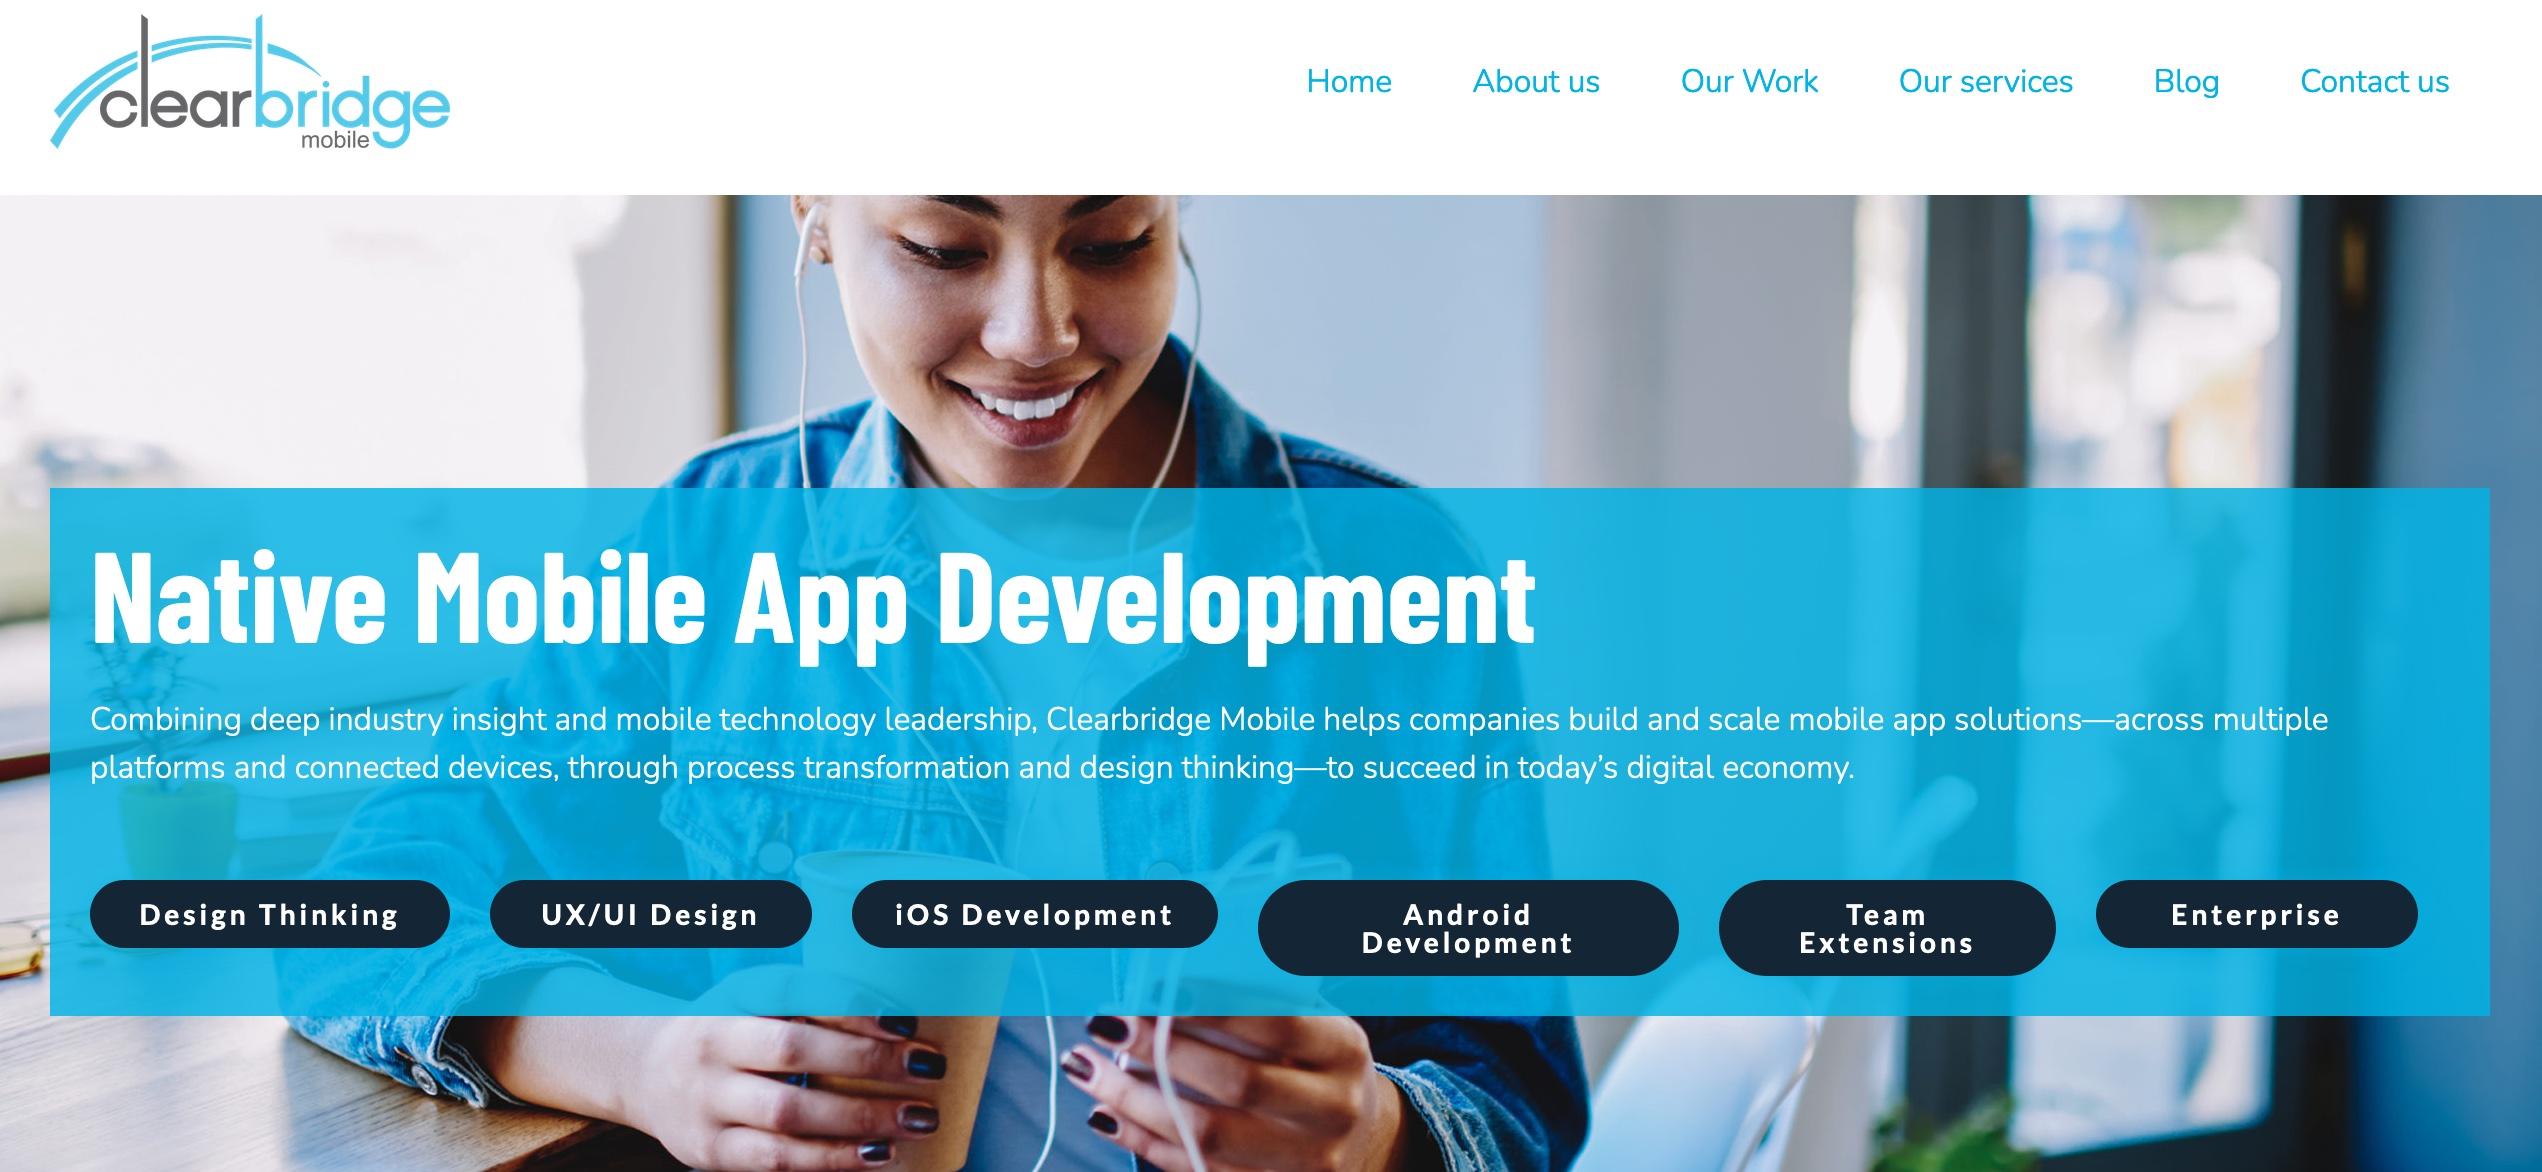 Clearbridge Mobile and app development